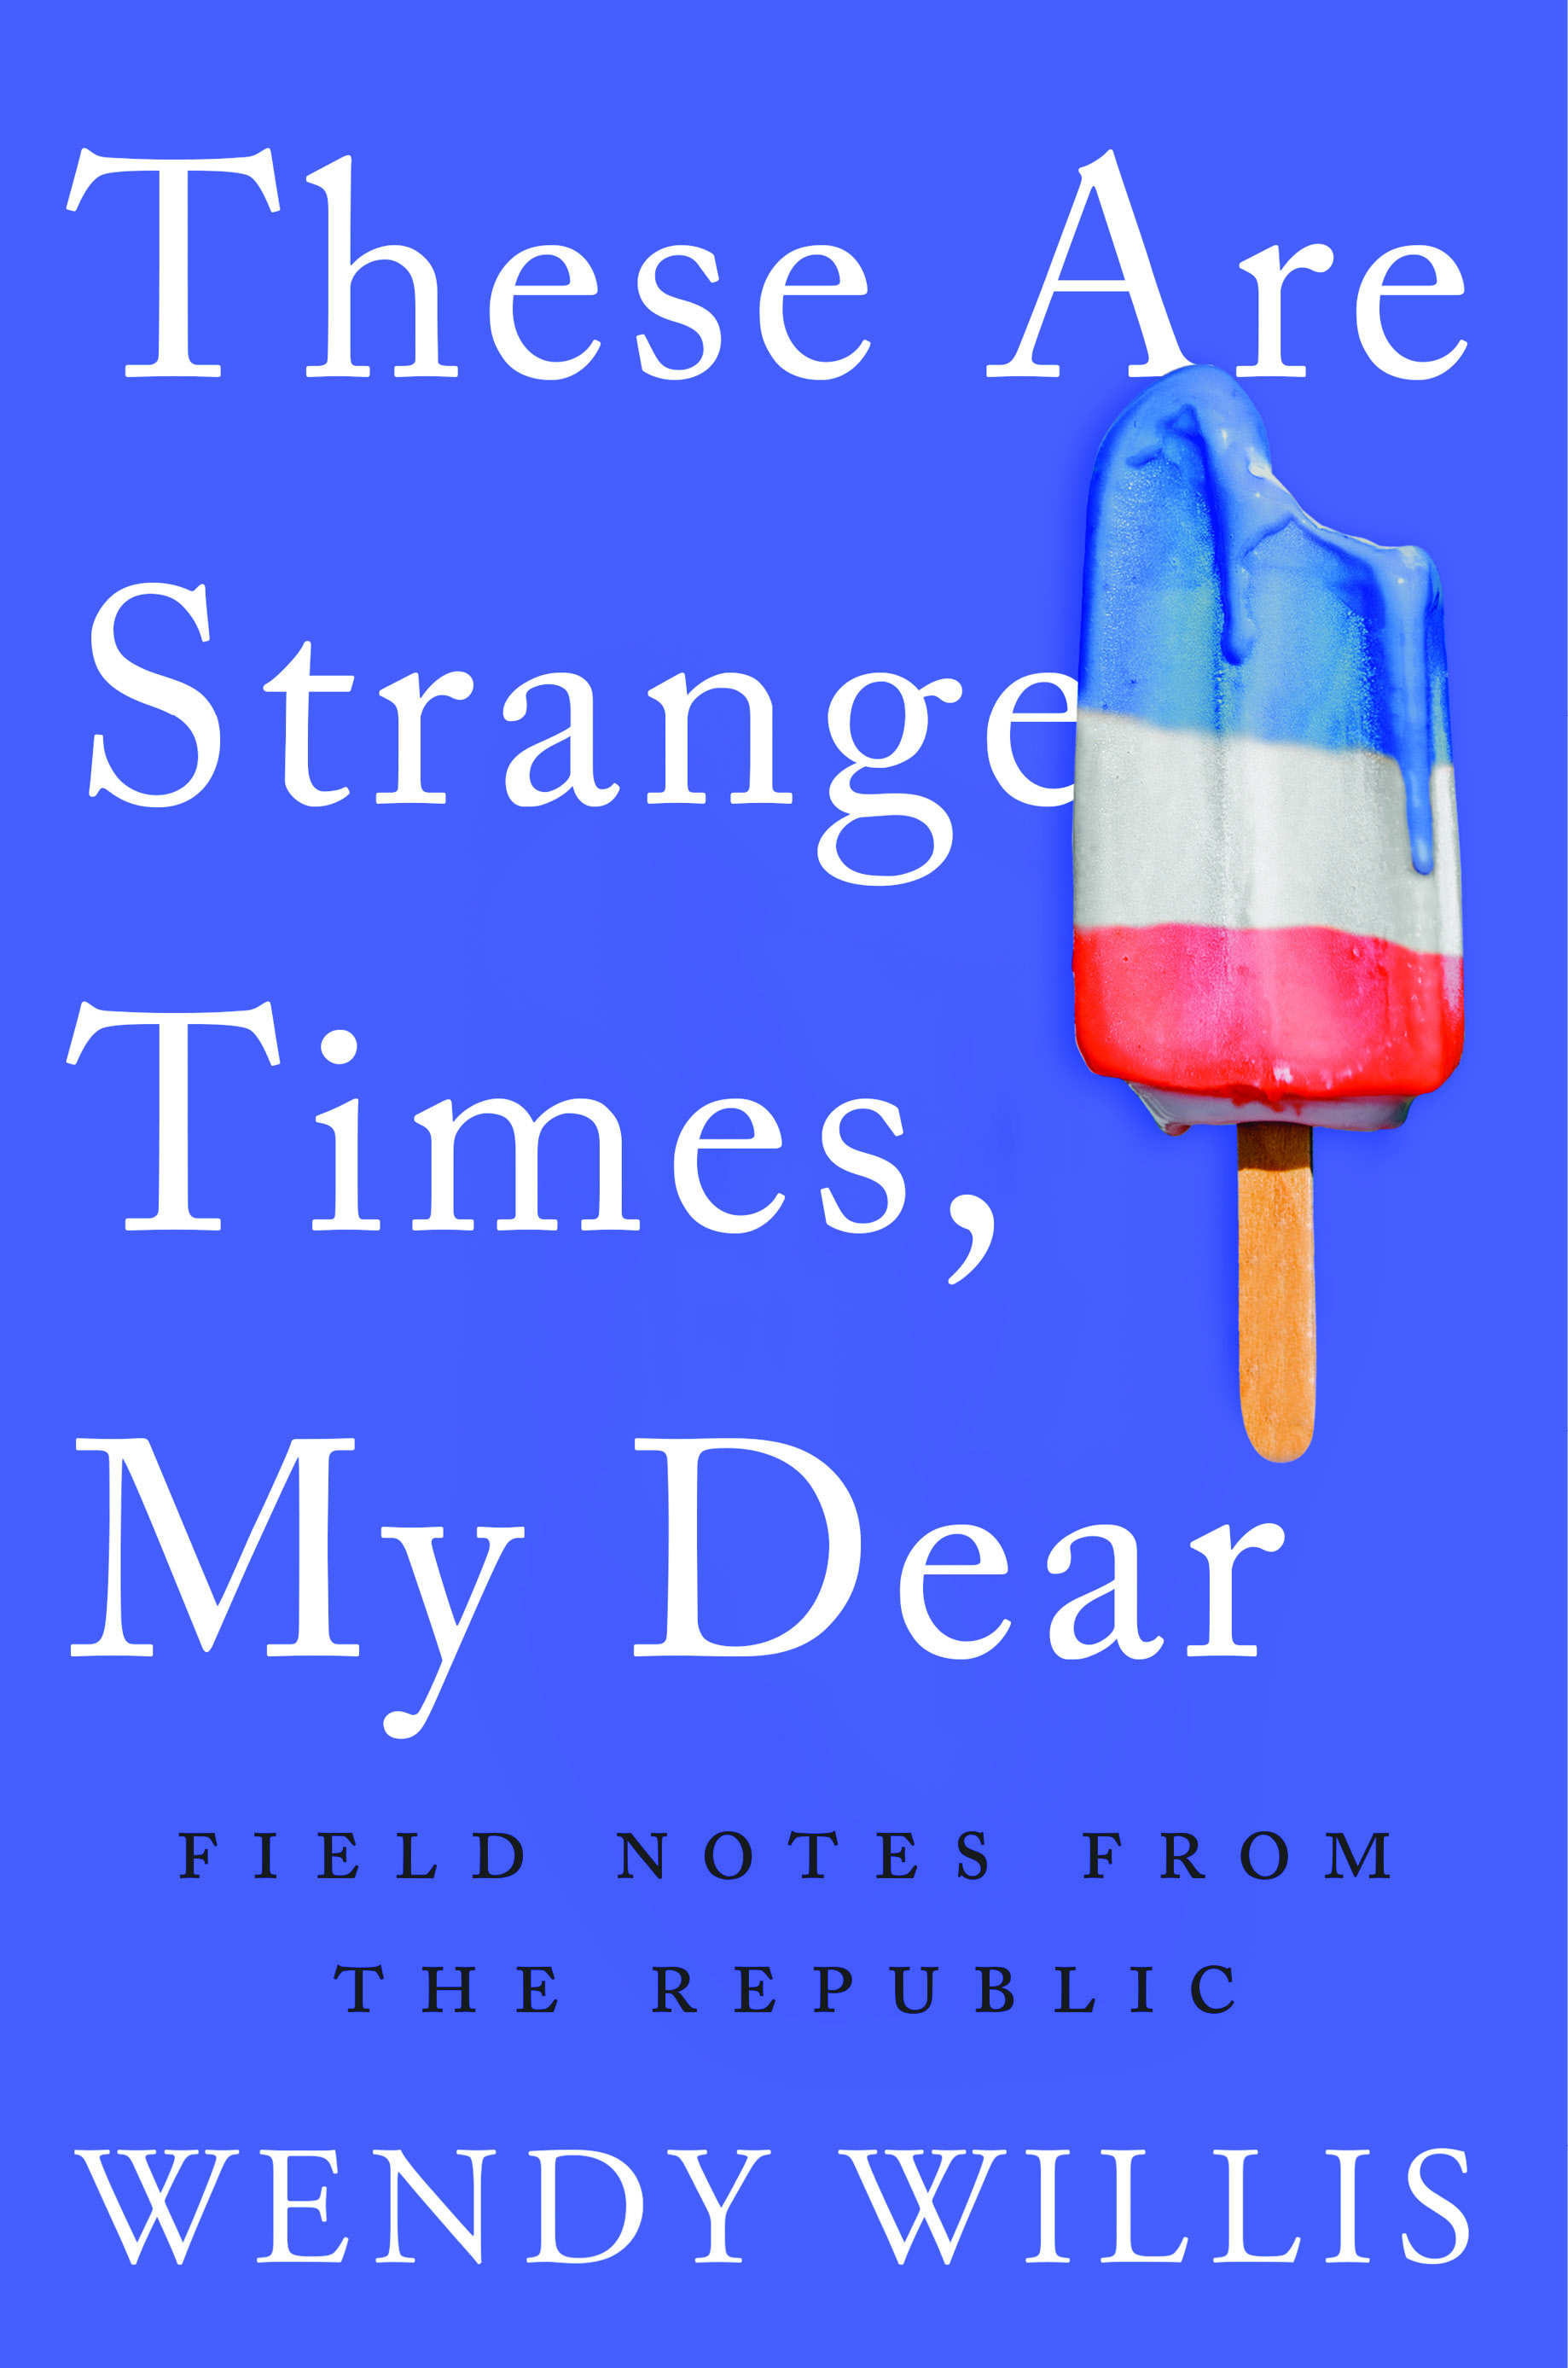 These Are Strange Times My Dear_cvr_300dpi print res (1).jpg